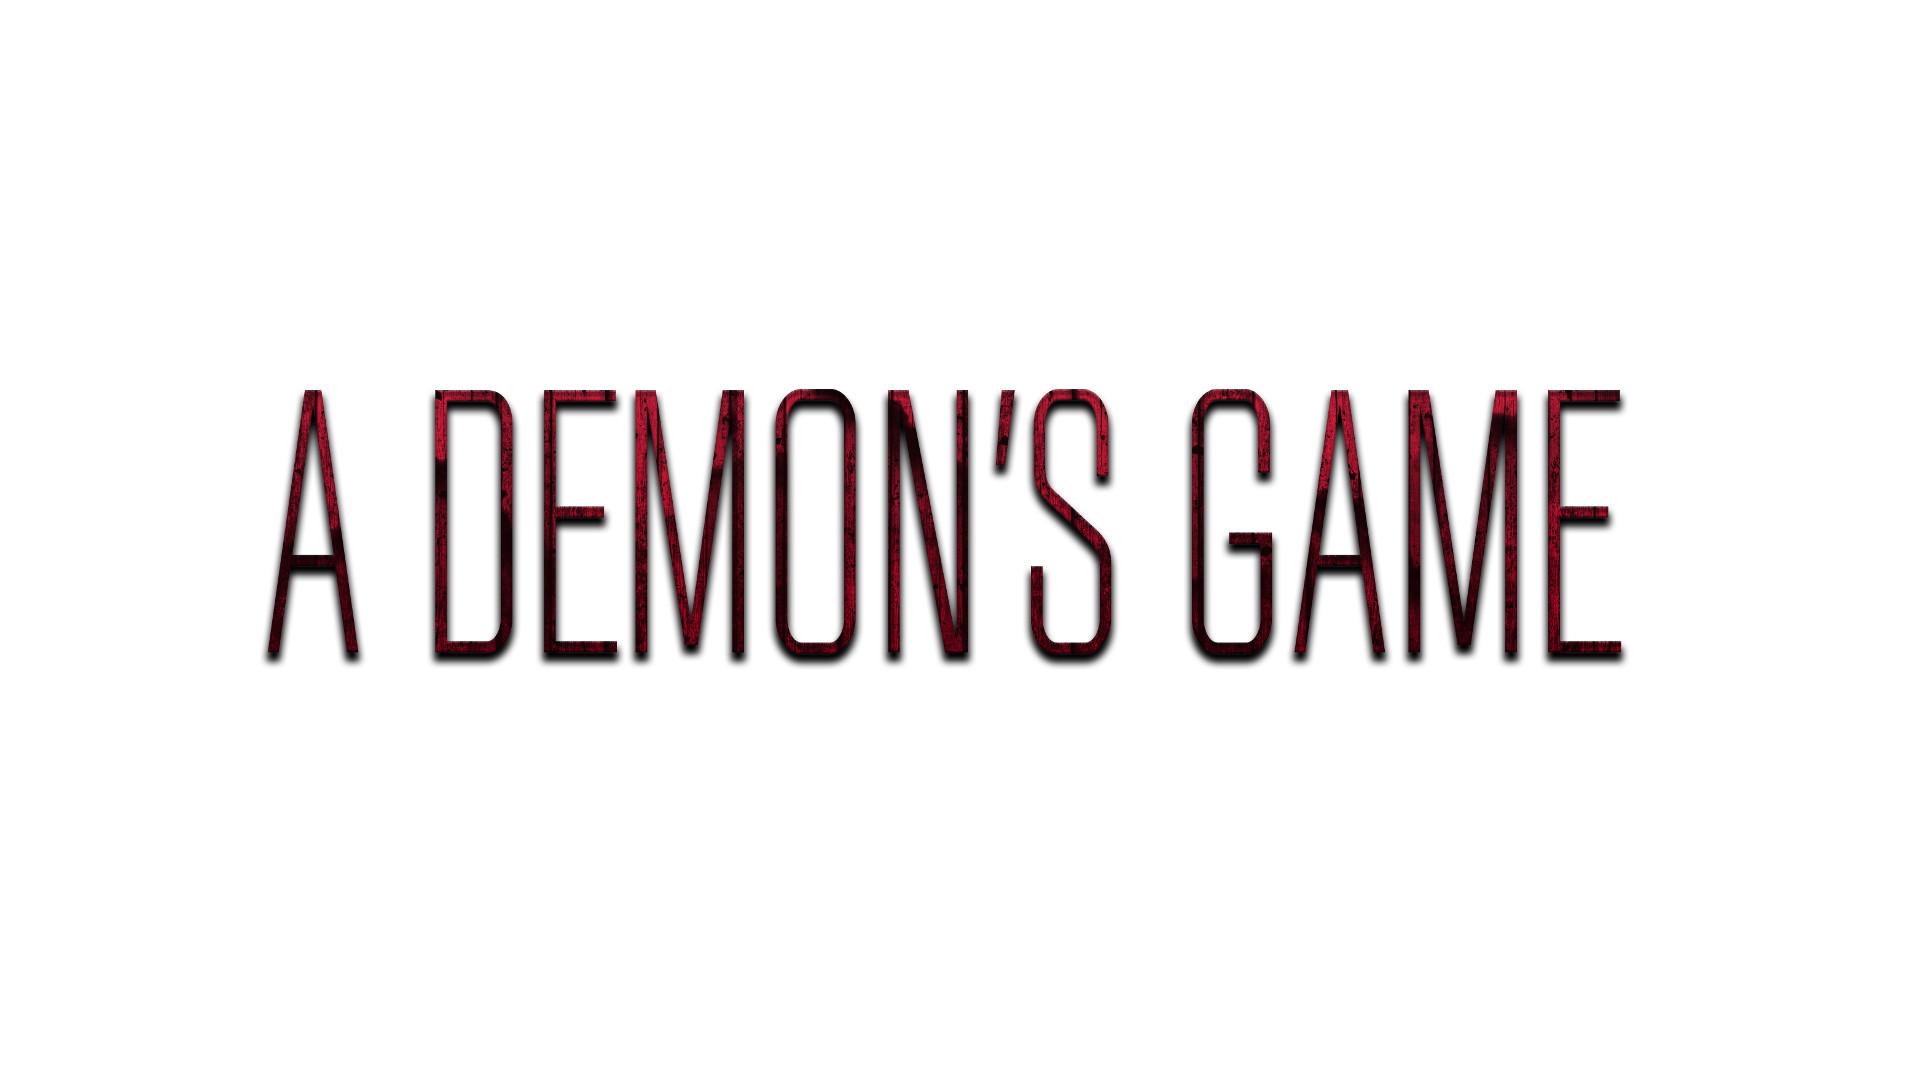 Demons gameNOBG 1080p LE